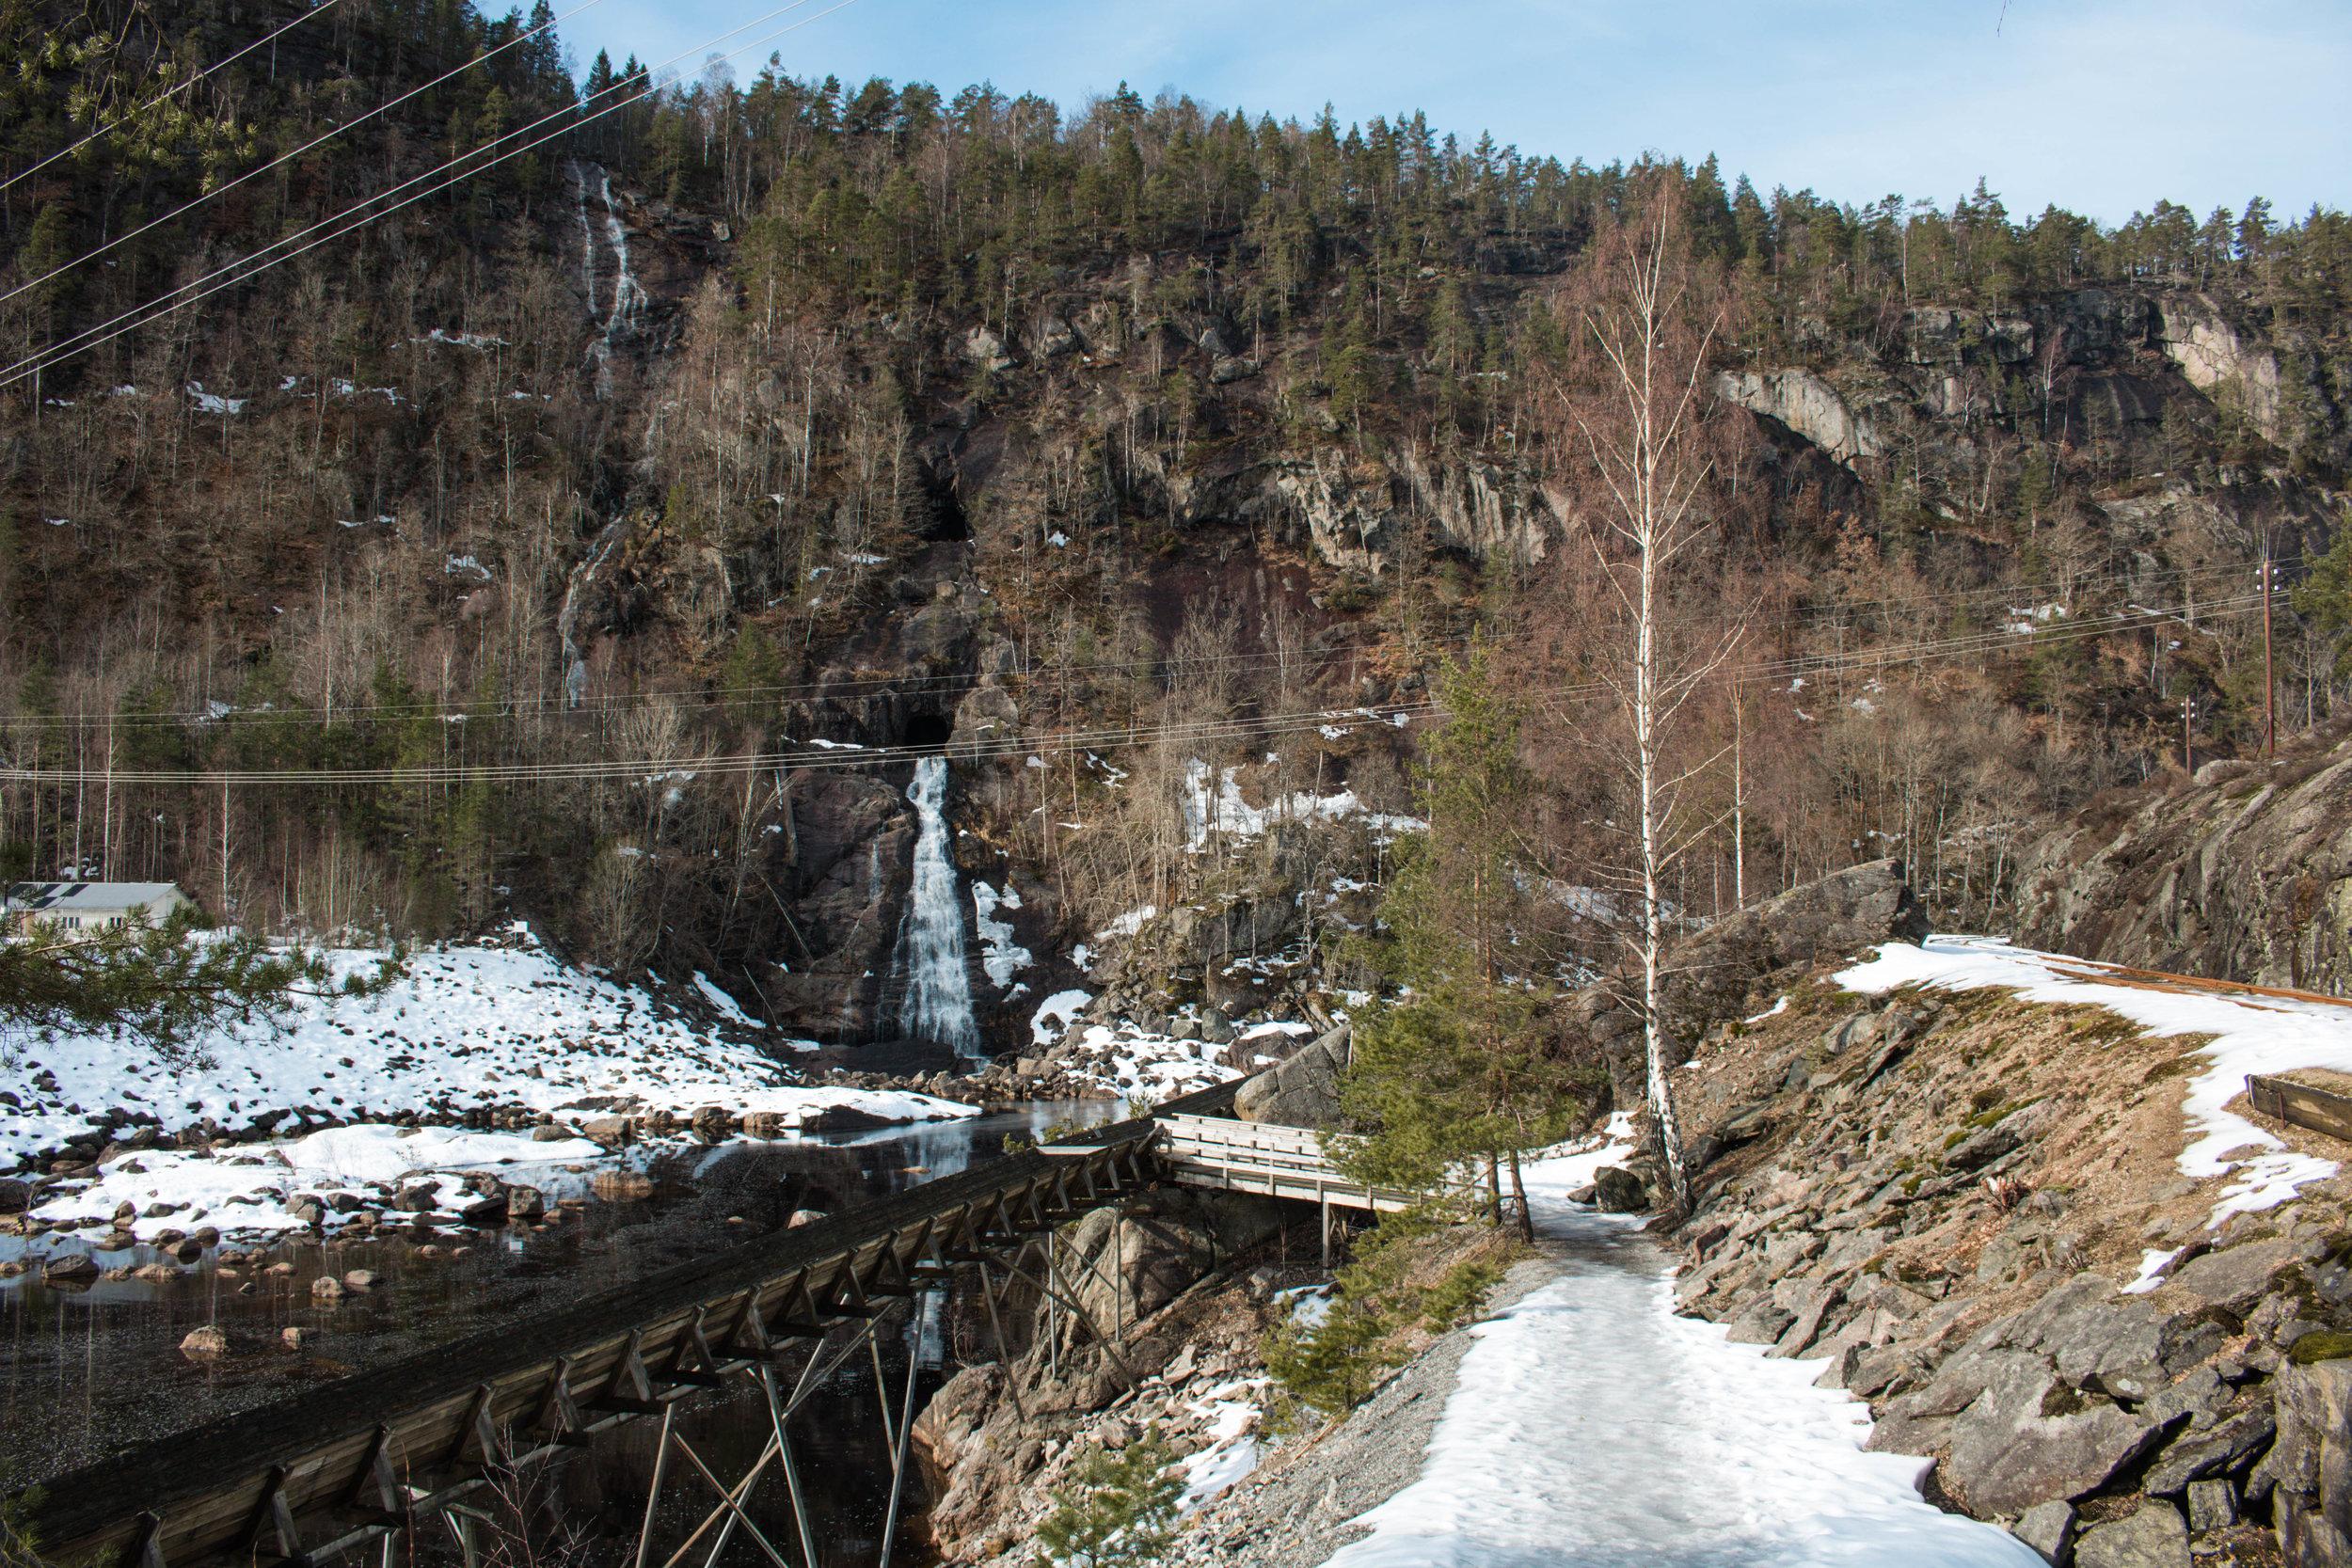 Steinsfossen waterfall marks the beginning of the trail